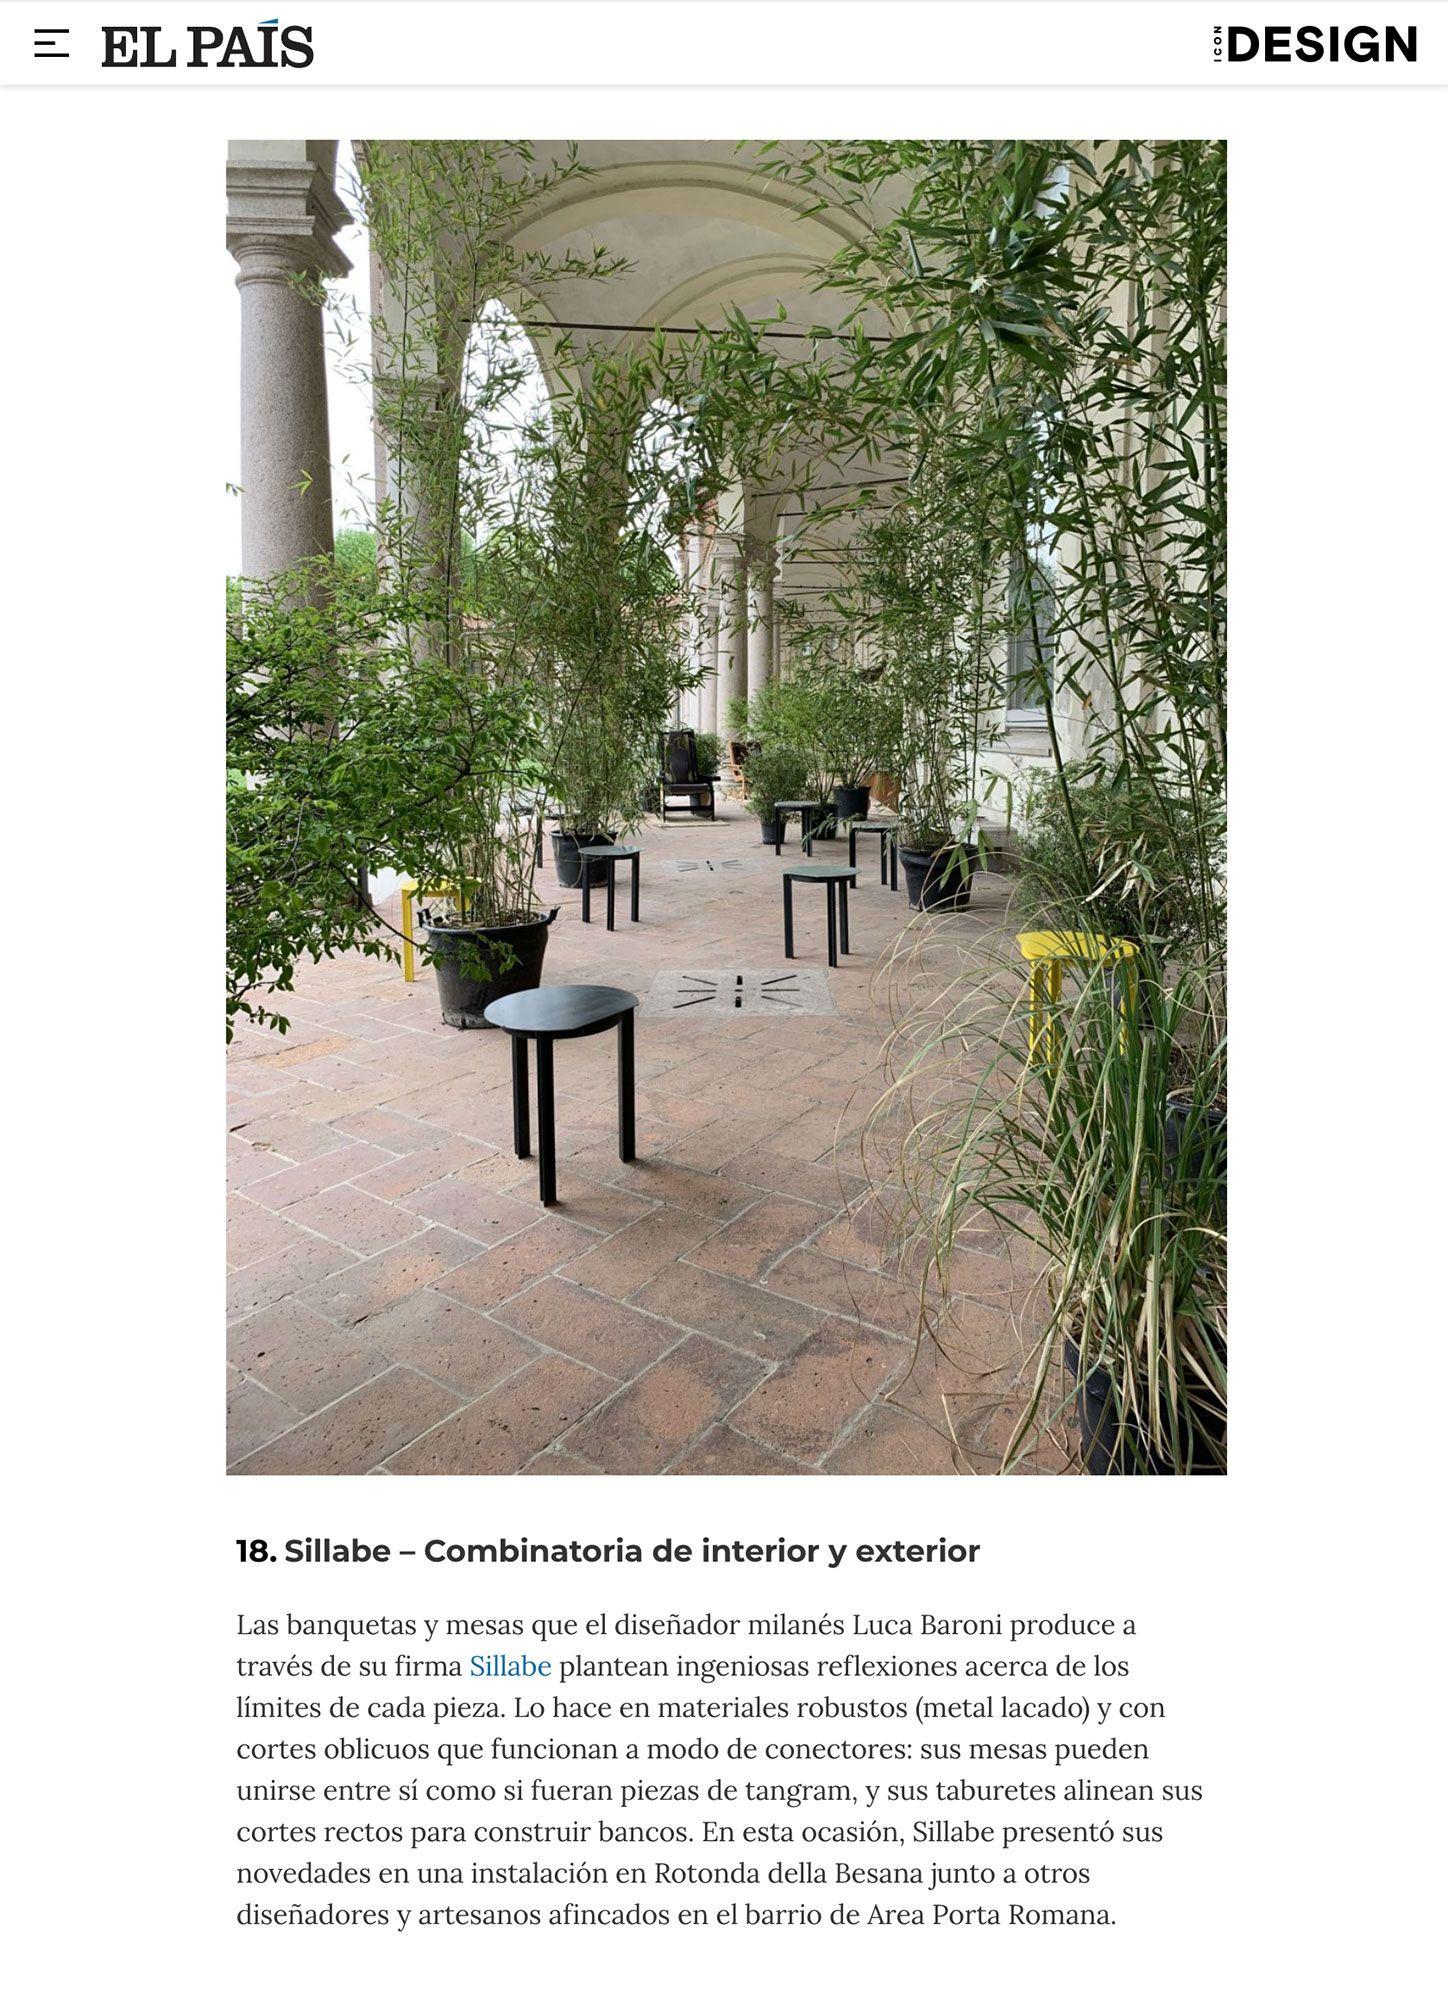 Sillabe Luca Baroni Press El Pais